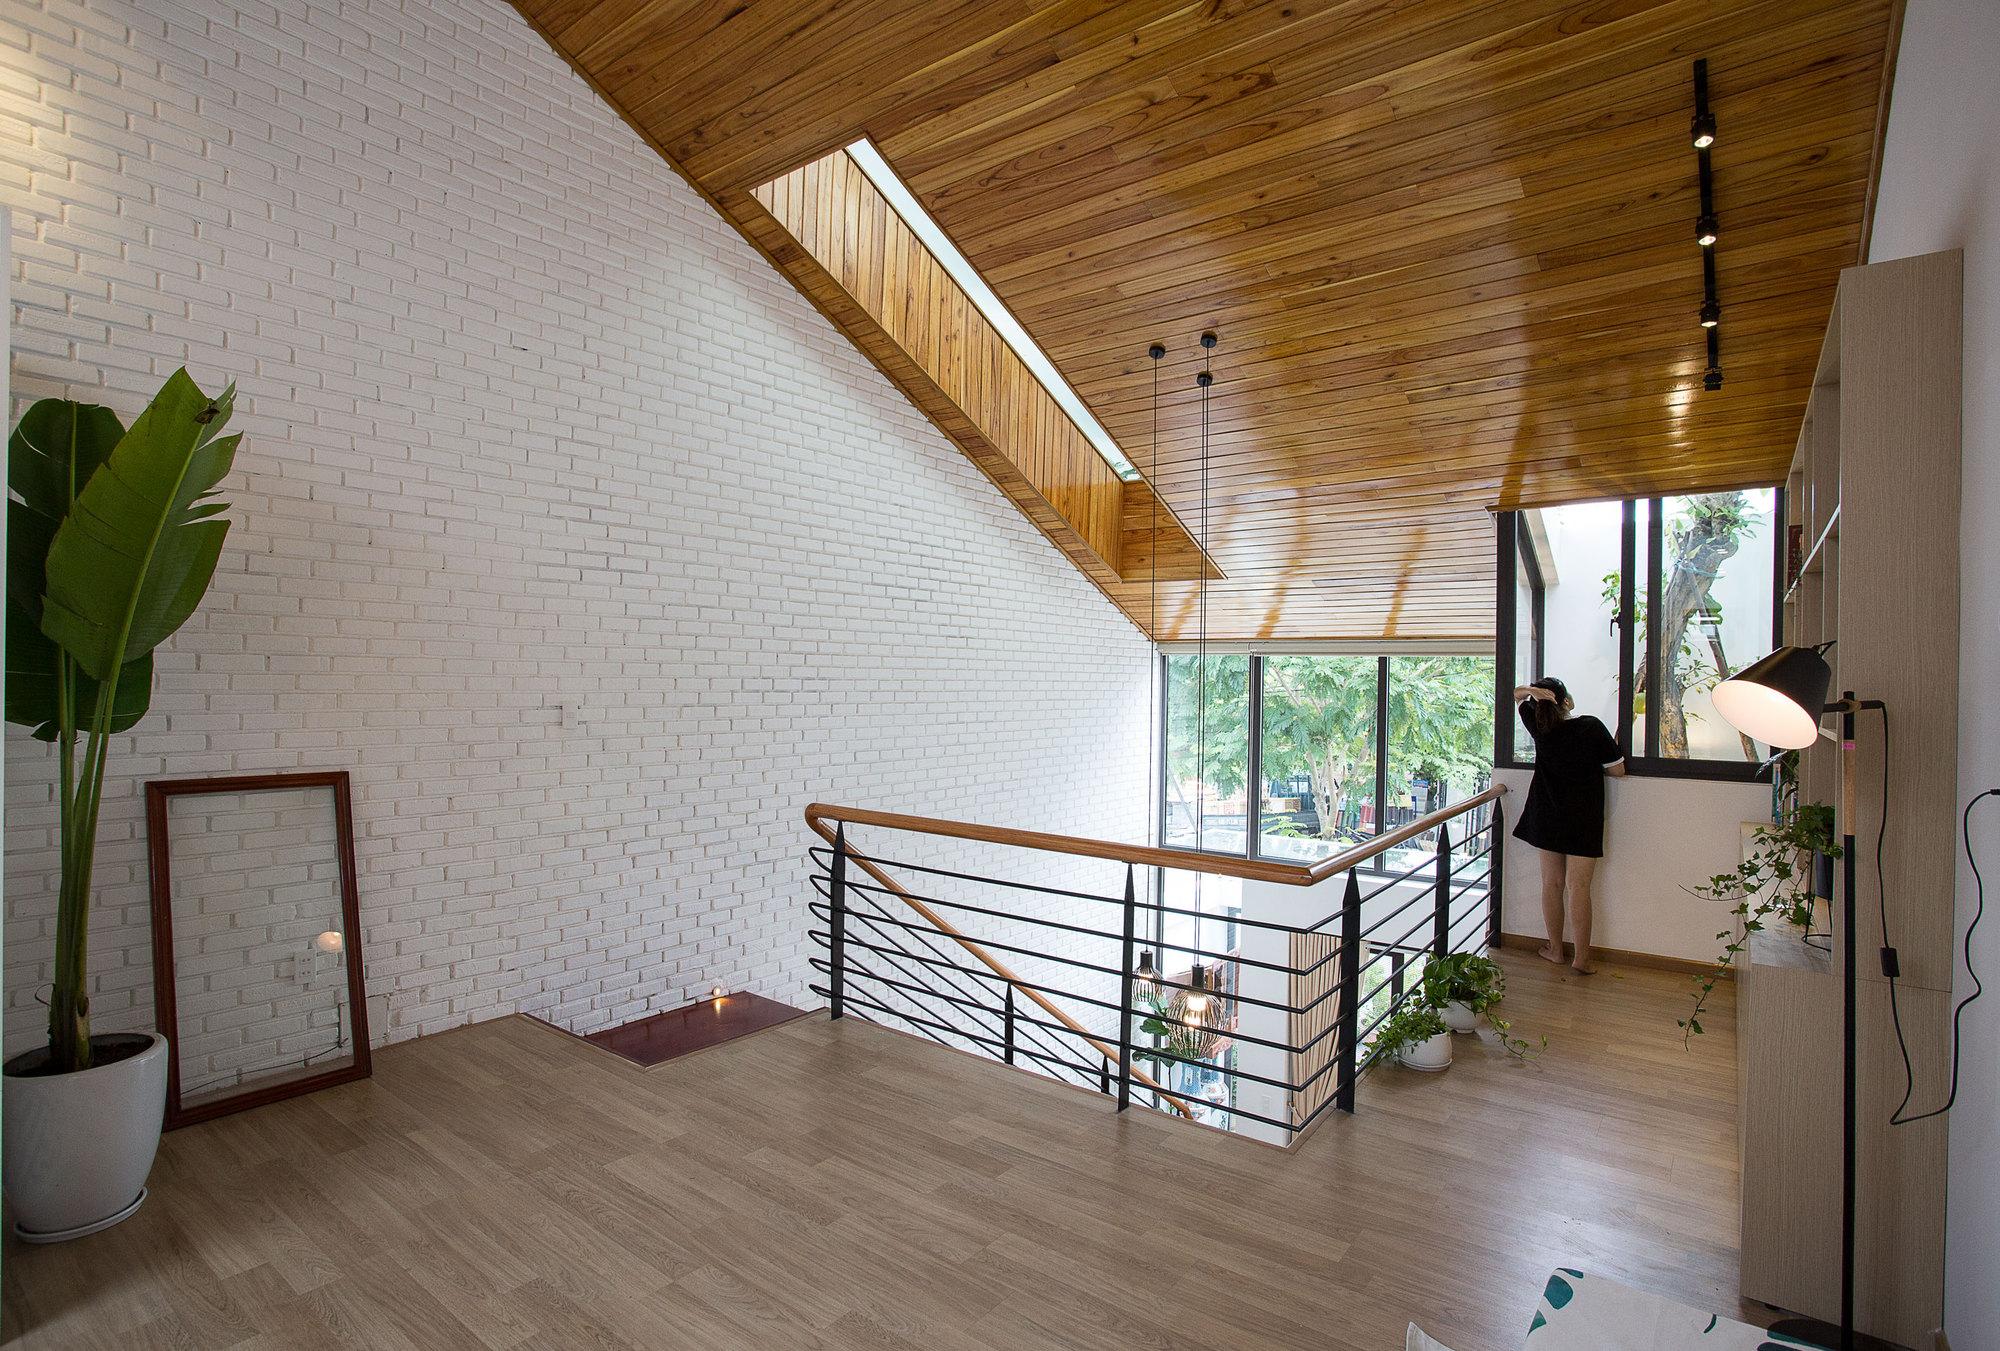 Galeria de casa minimalista 85 design 9 for Design minimalista